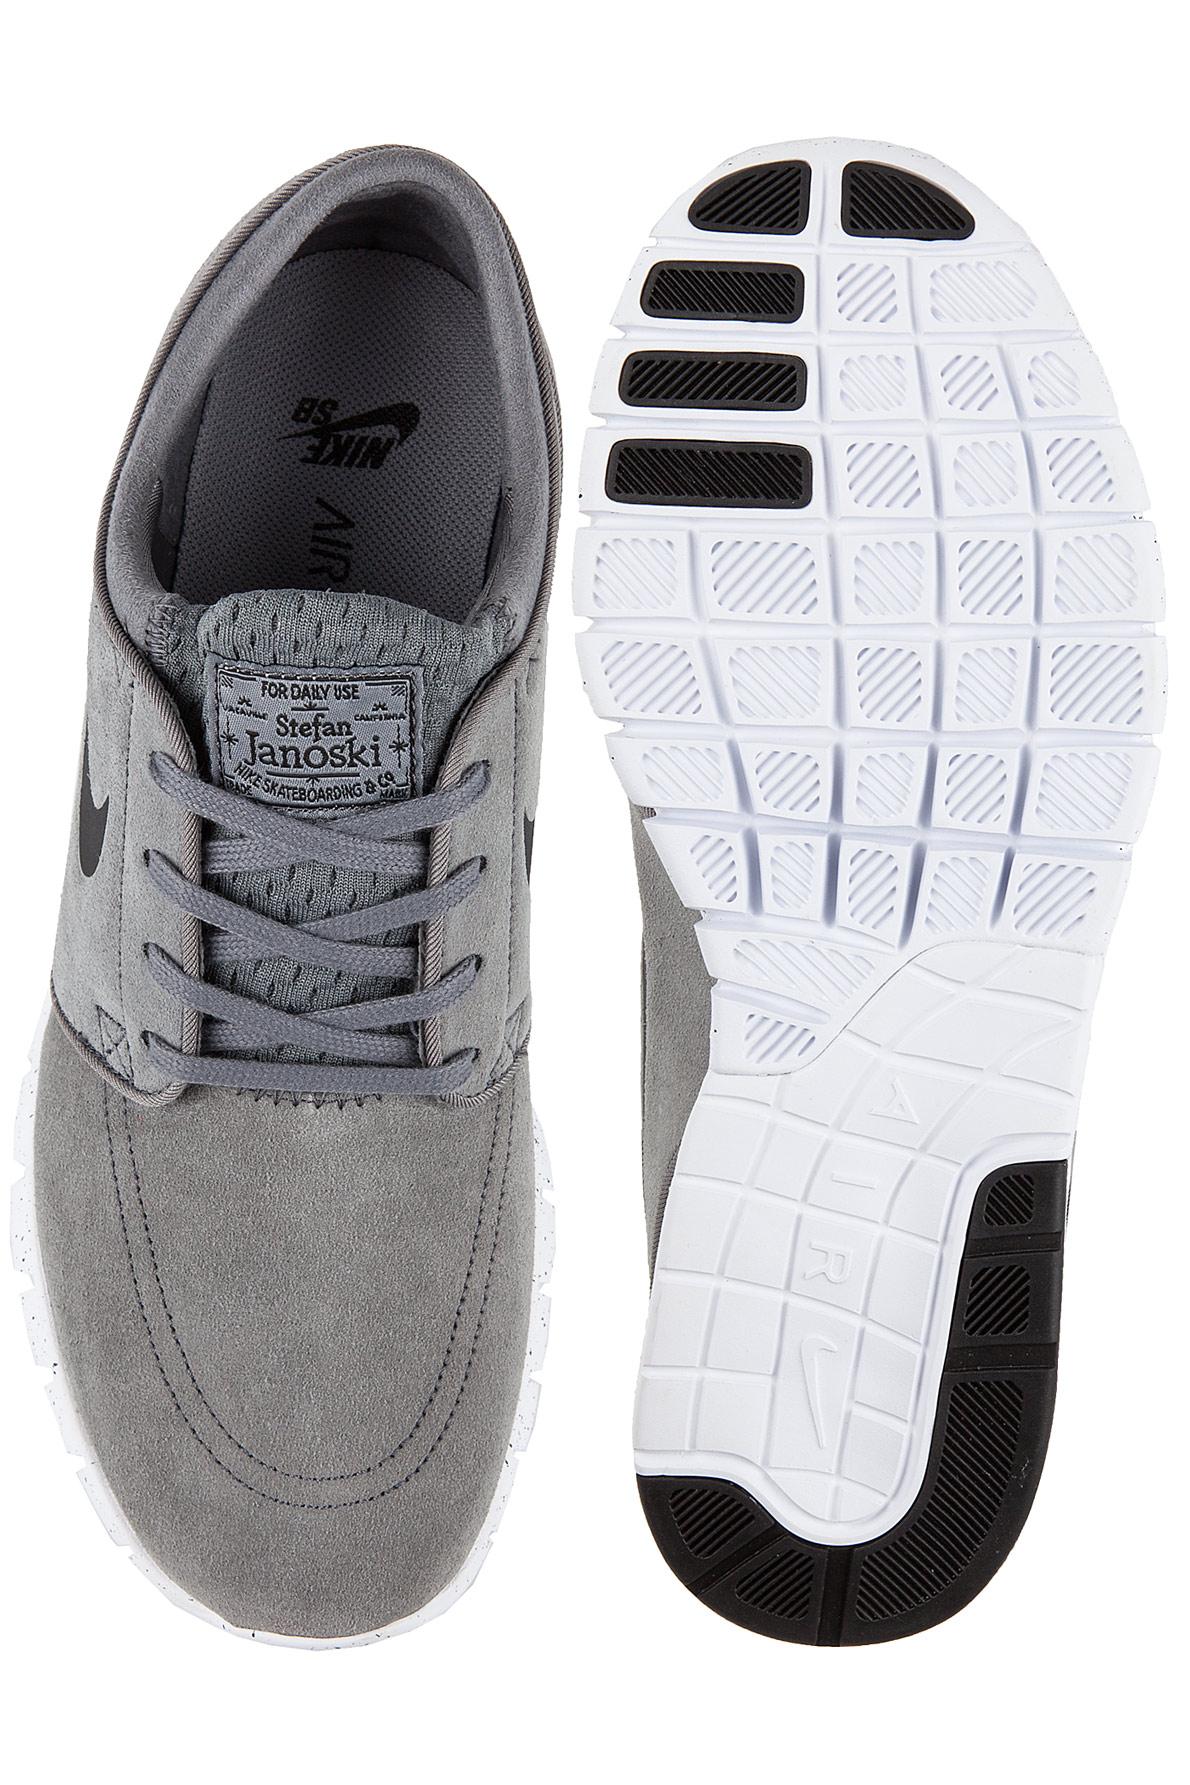 Nike Stefan Janoski Max Cool Grey